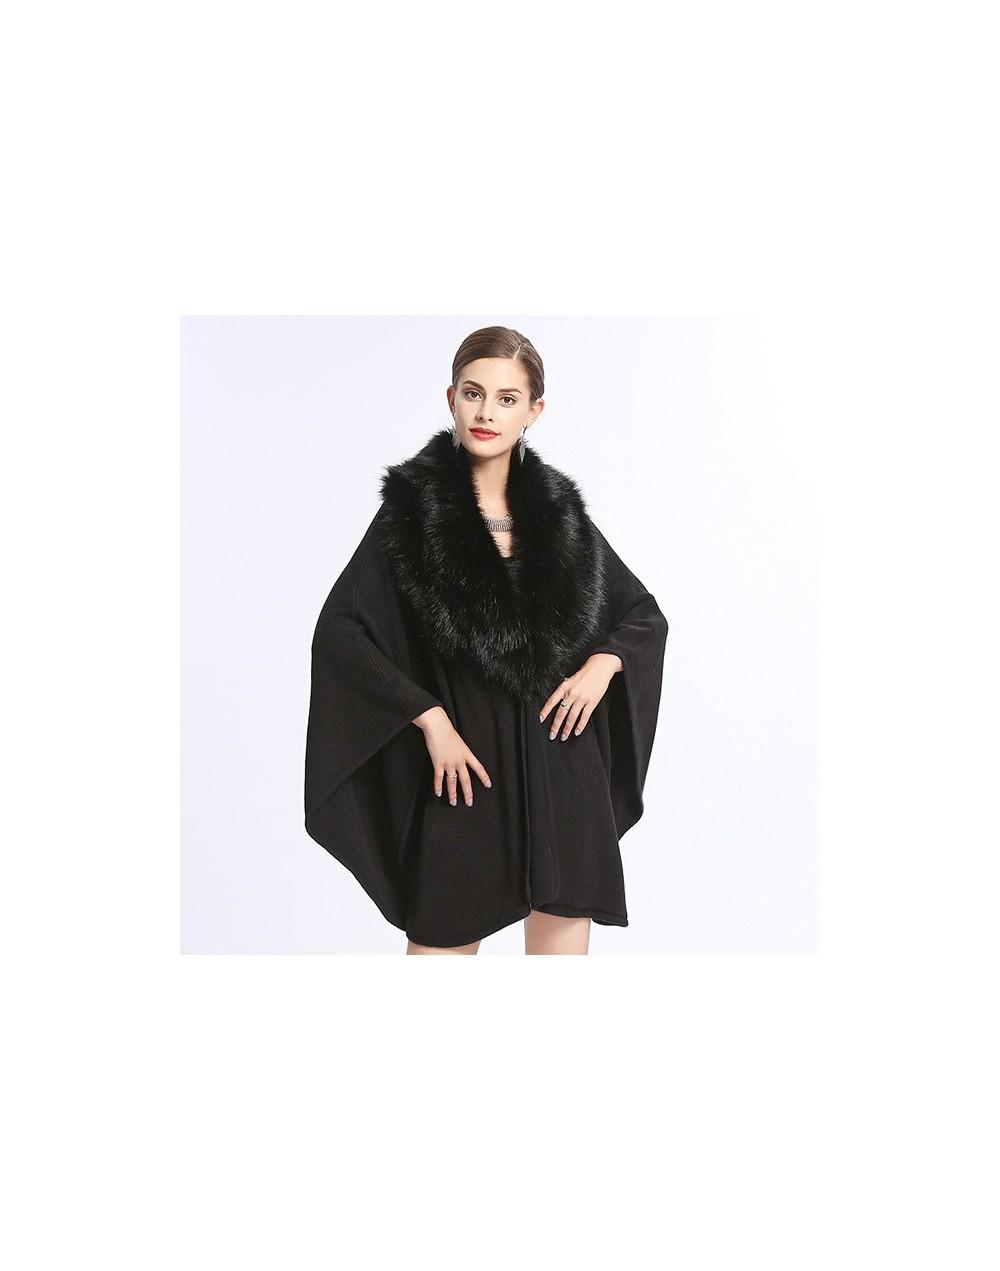 Fashion Autumn And Winter New Women Shawl Cloak Lady Fake Fox Fur Big Collar Loose Knit Poncho Cardigan Sweater - Black - 42...